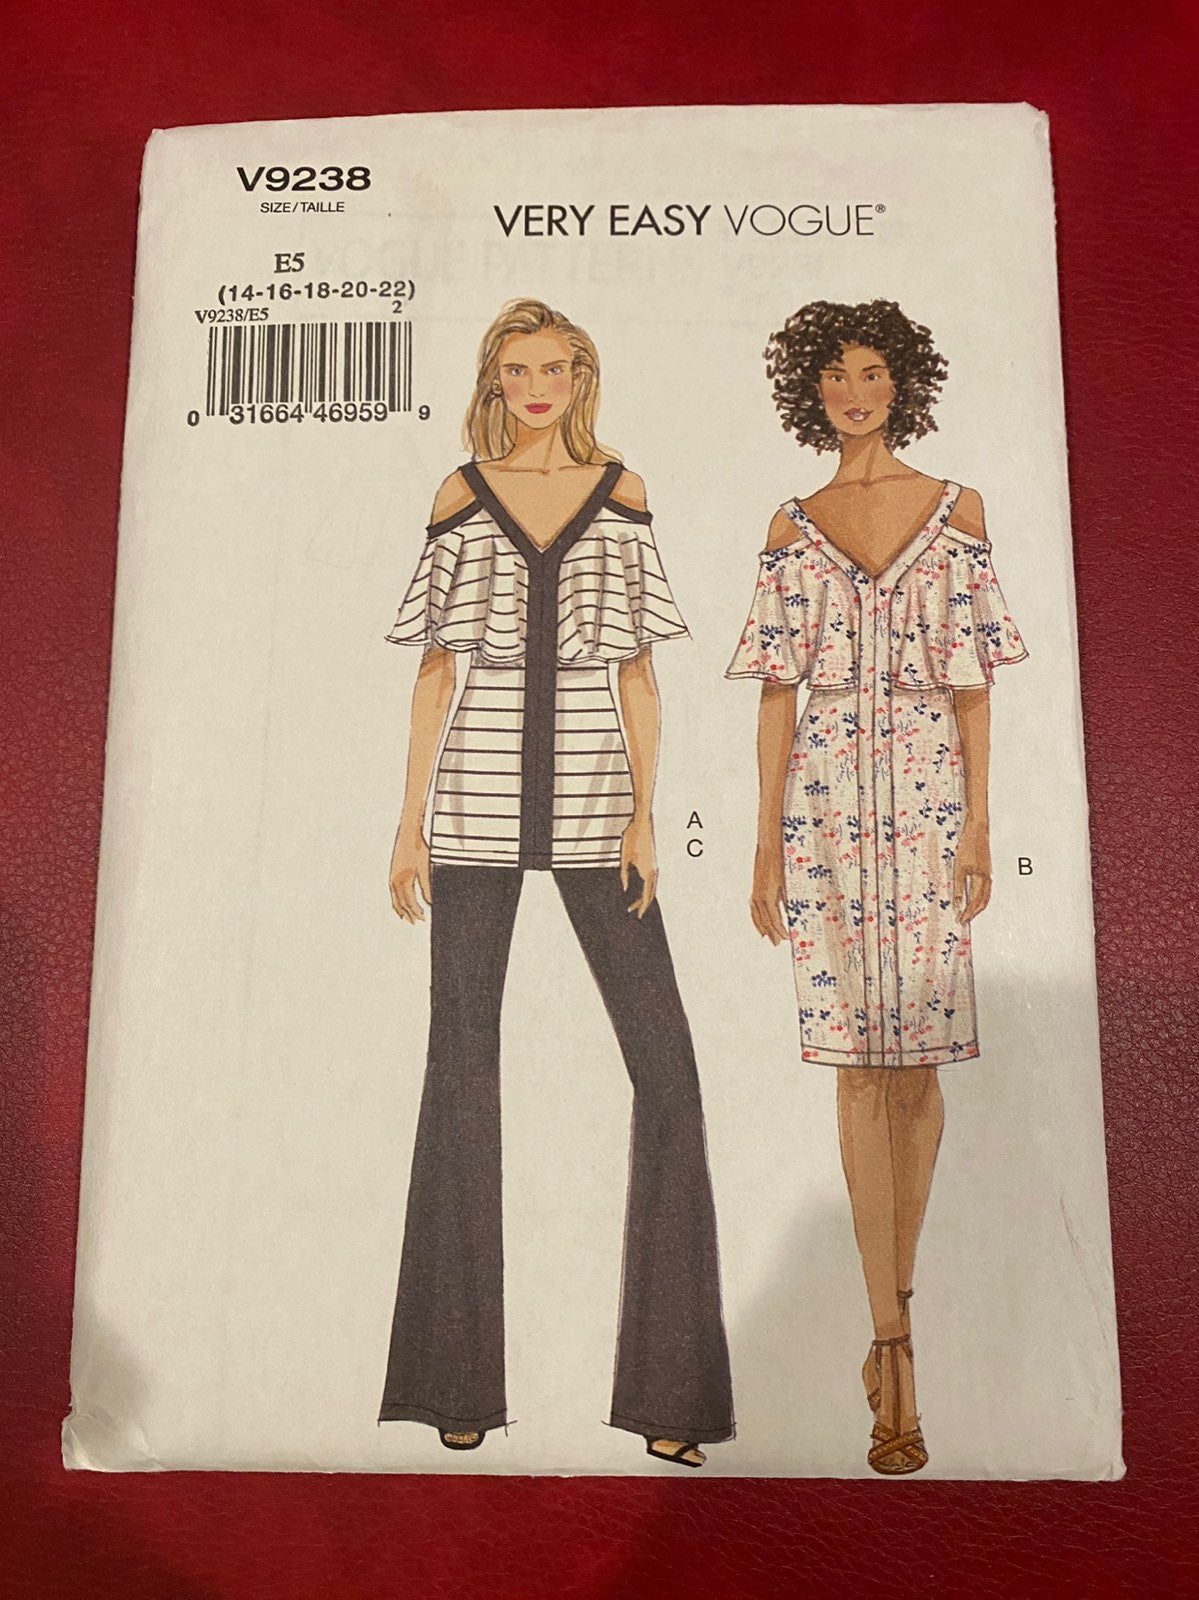 V9238 Vogue plus size sewing pattern